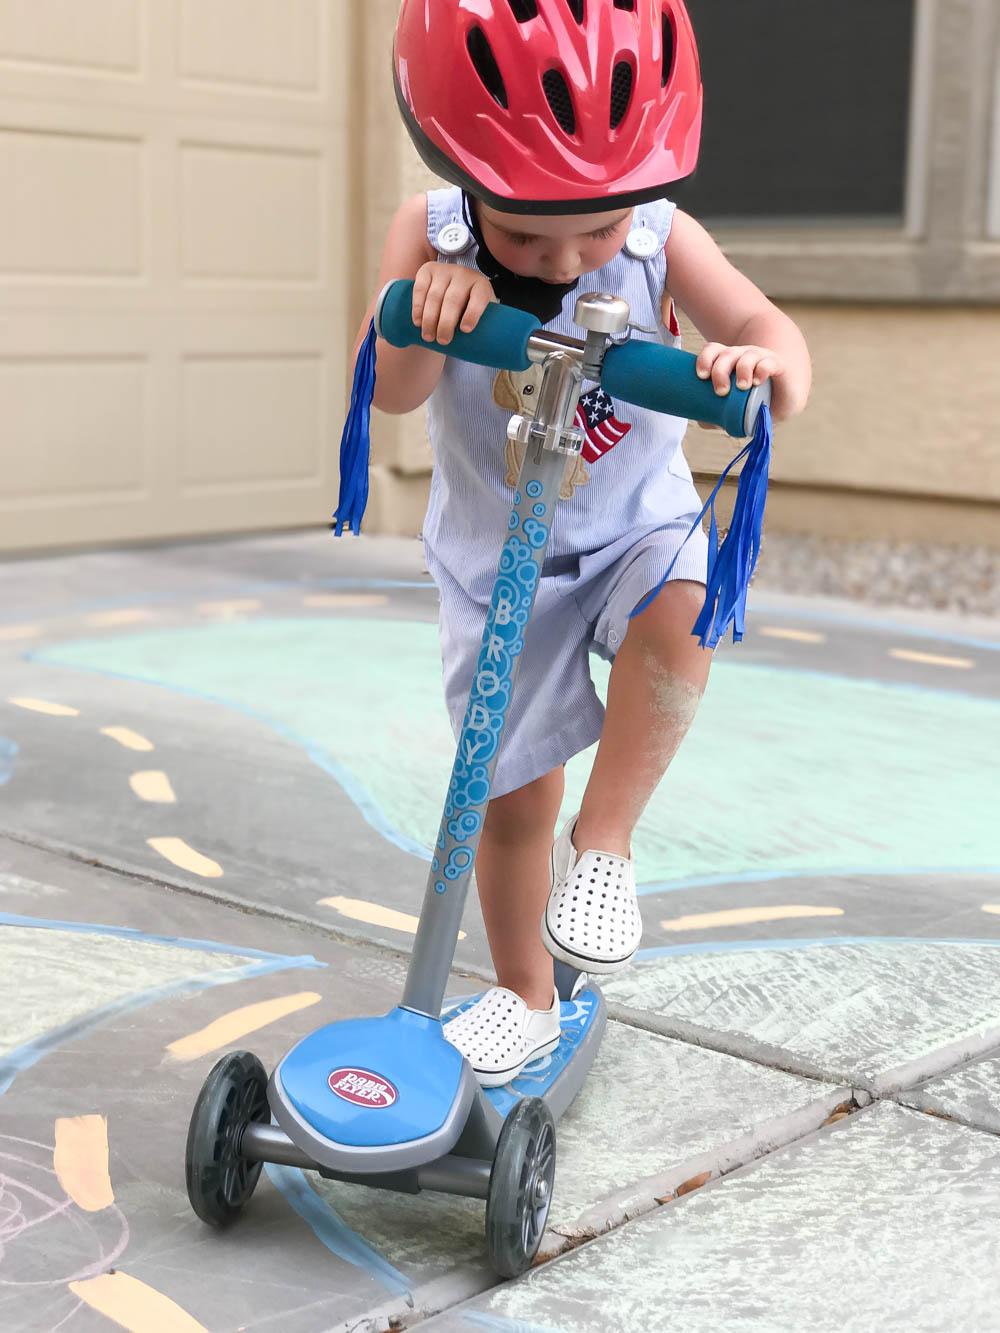 Driveway Chalk Scooter Racetrack   Toddler Imagination   Imaginative Play   Radio Flyer   #sponsored